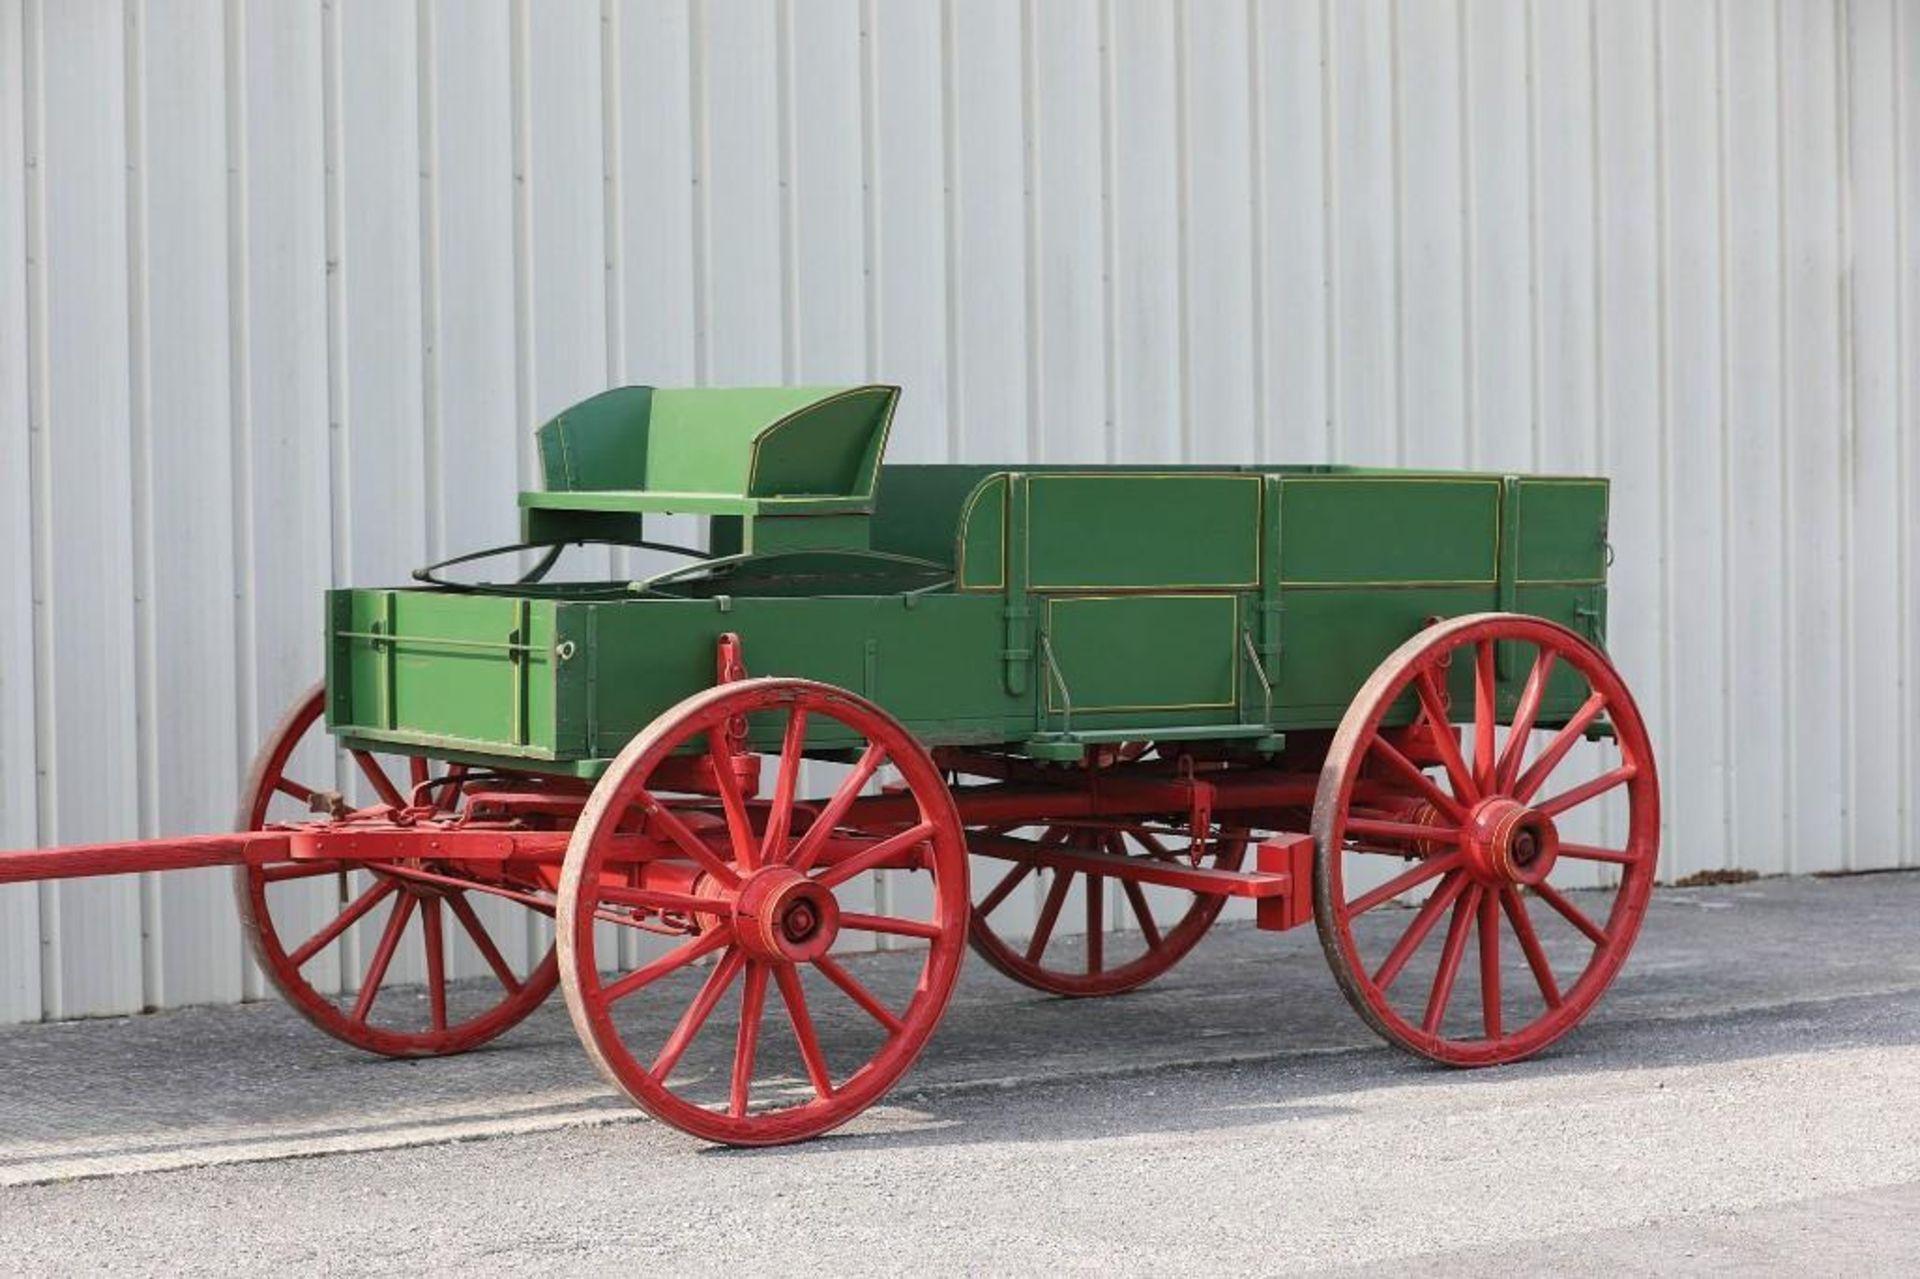 Restored Box Bed Farm Wagon, Original Running Gear & Hardware, Marked 75W - Image 2 of 2